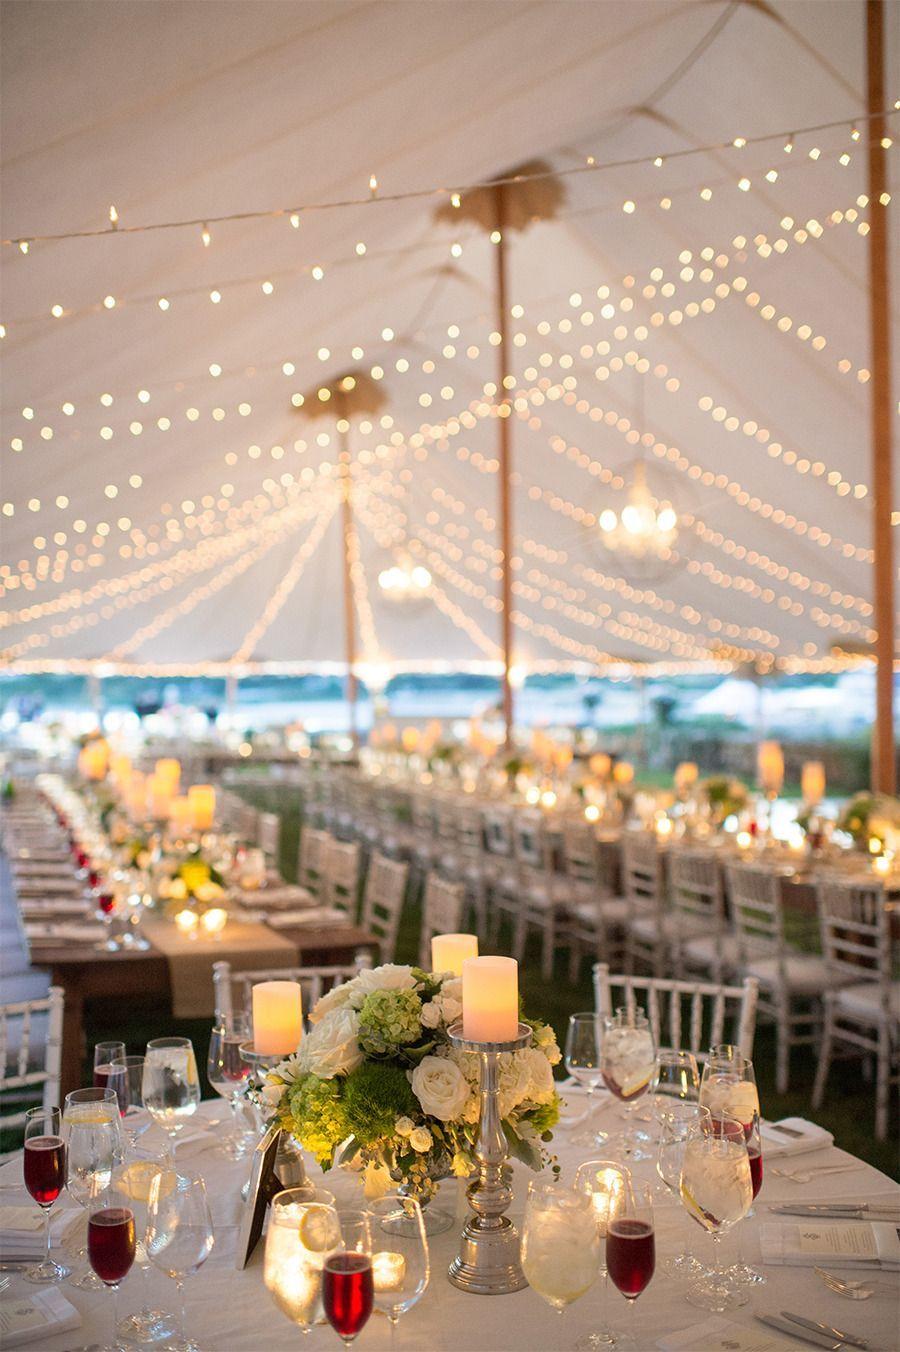 Wedding tent decoration images  Elegant Newport Estate Wedding  Ślub  Pinterest  Tent wedding